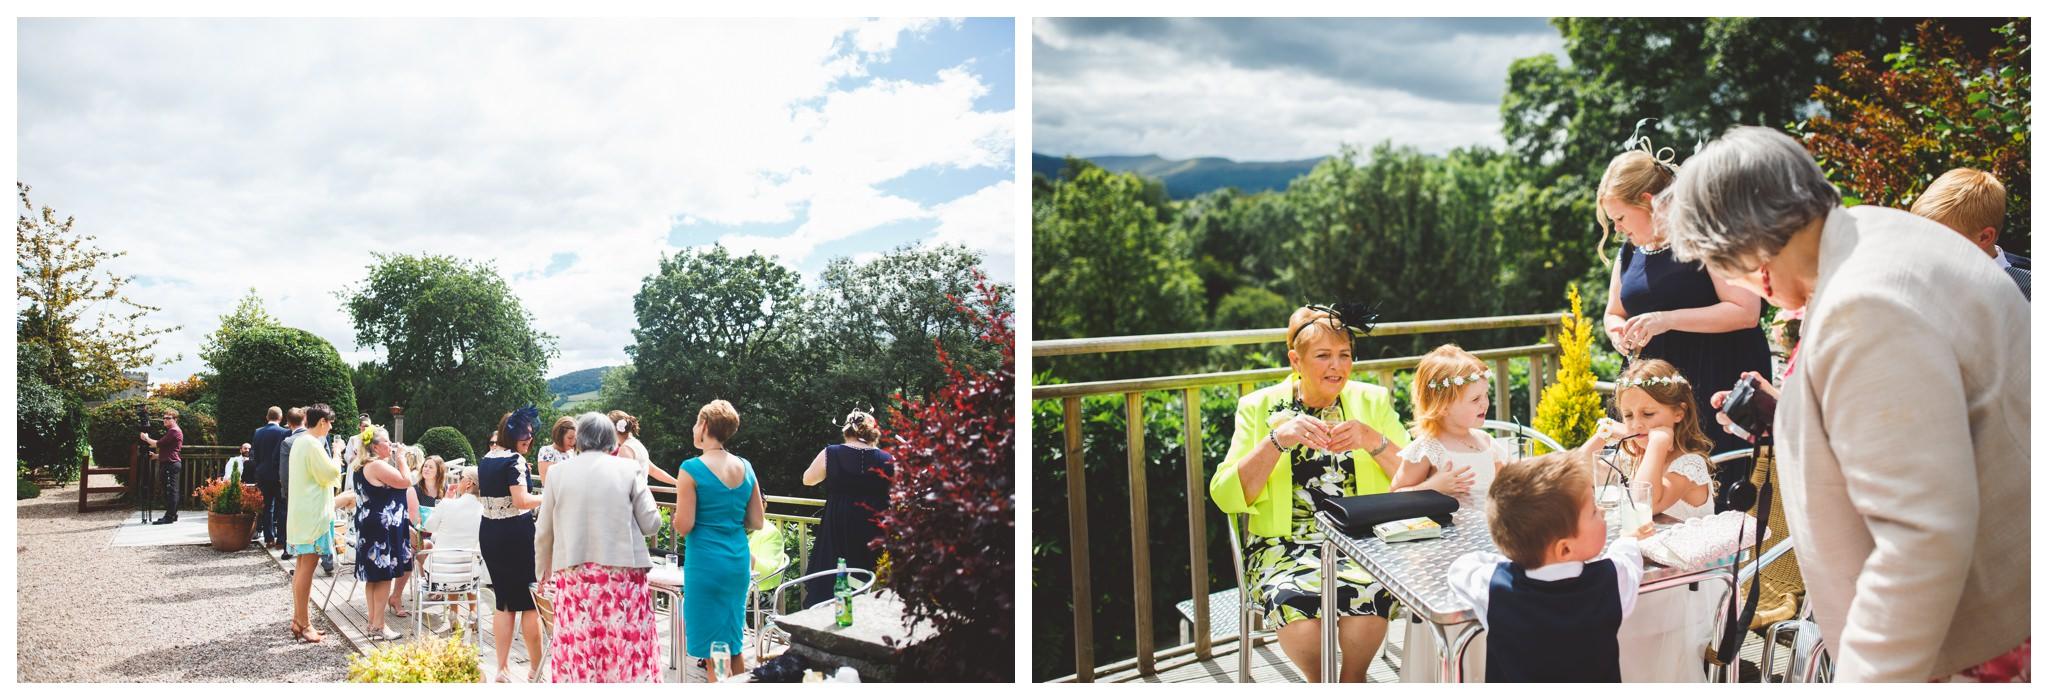 Richard Savage Photography - Wedding - Peterstone Court Brecon - 2016-05-11_0032